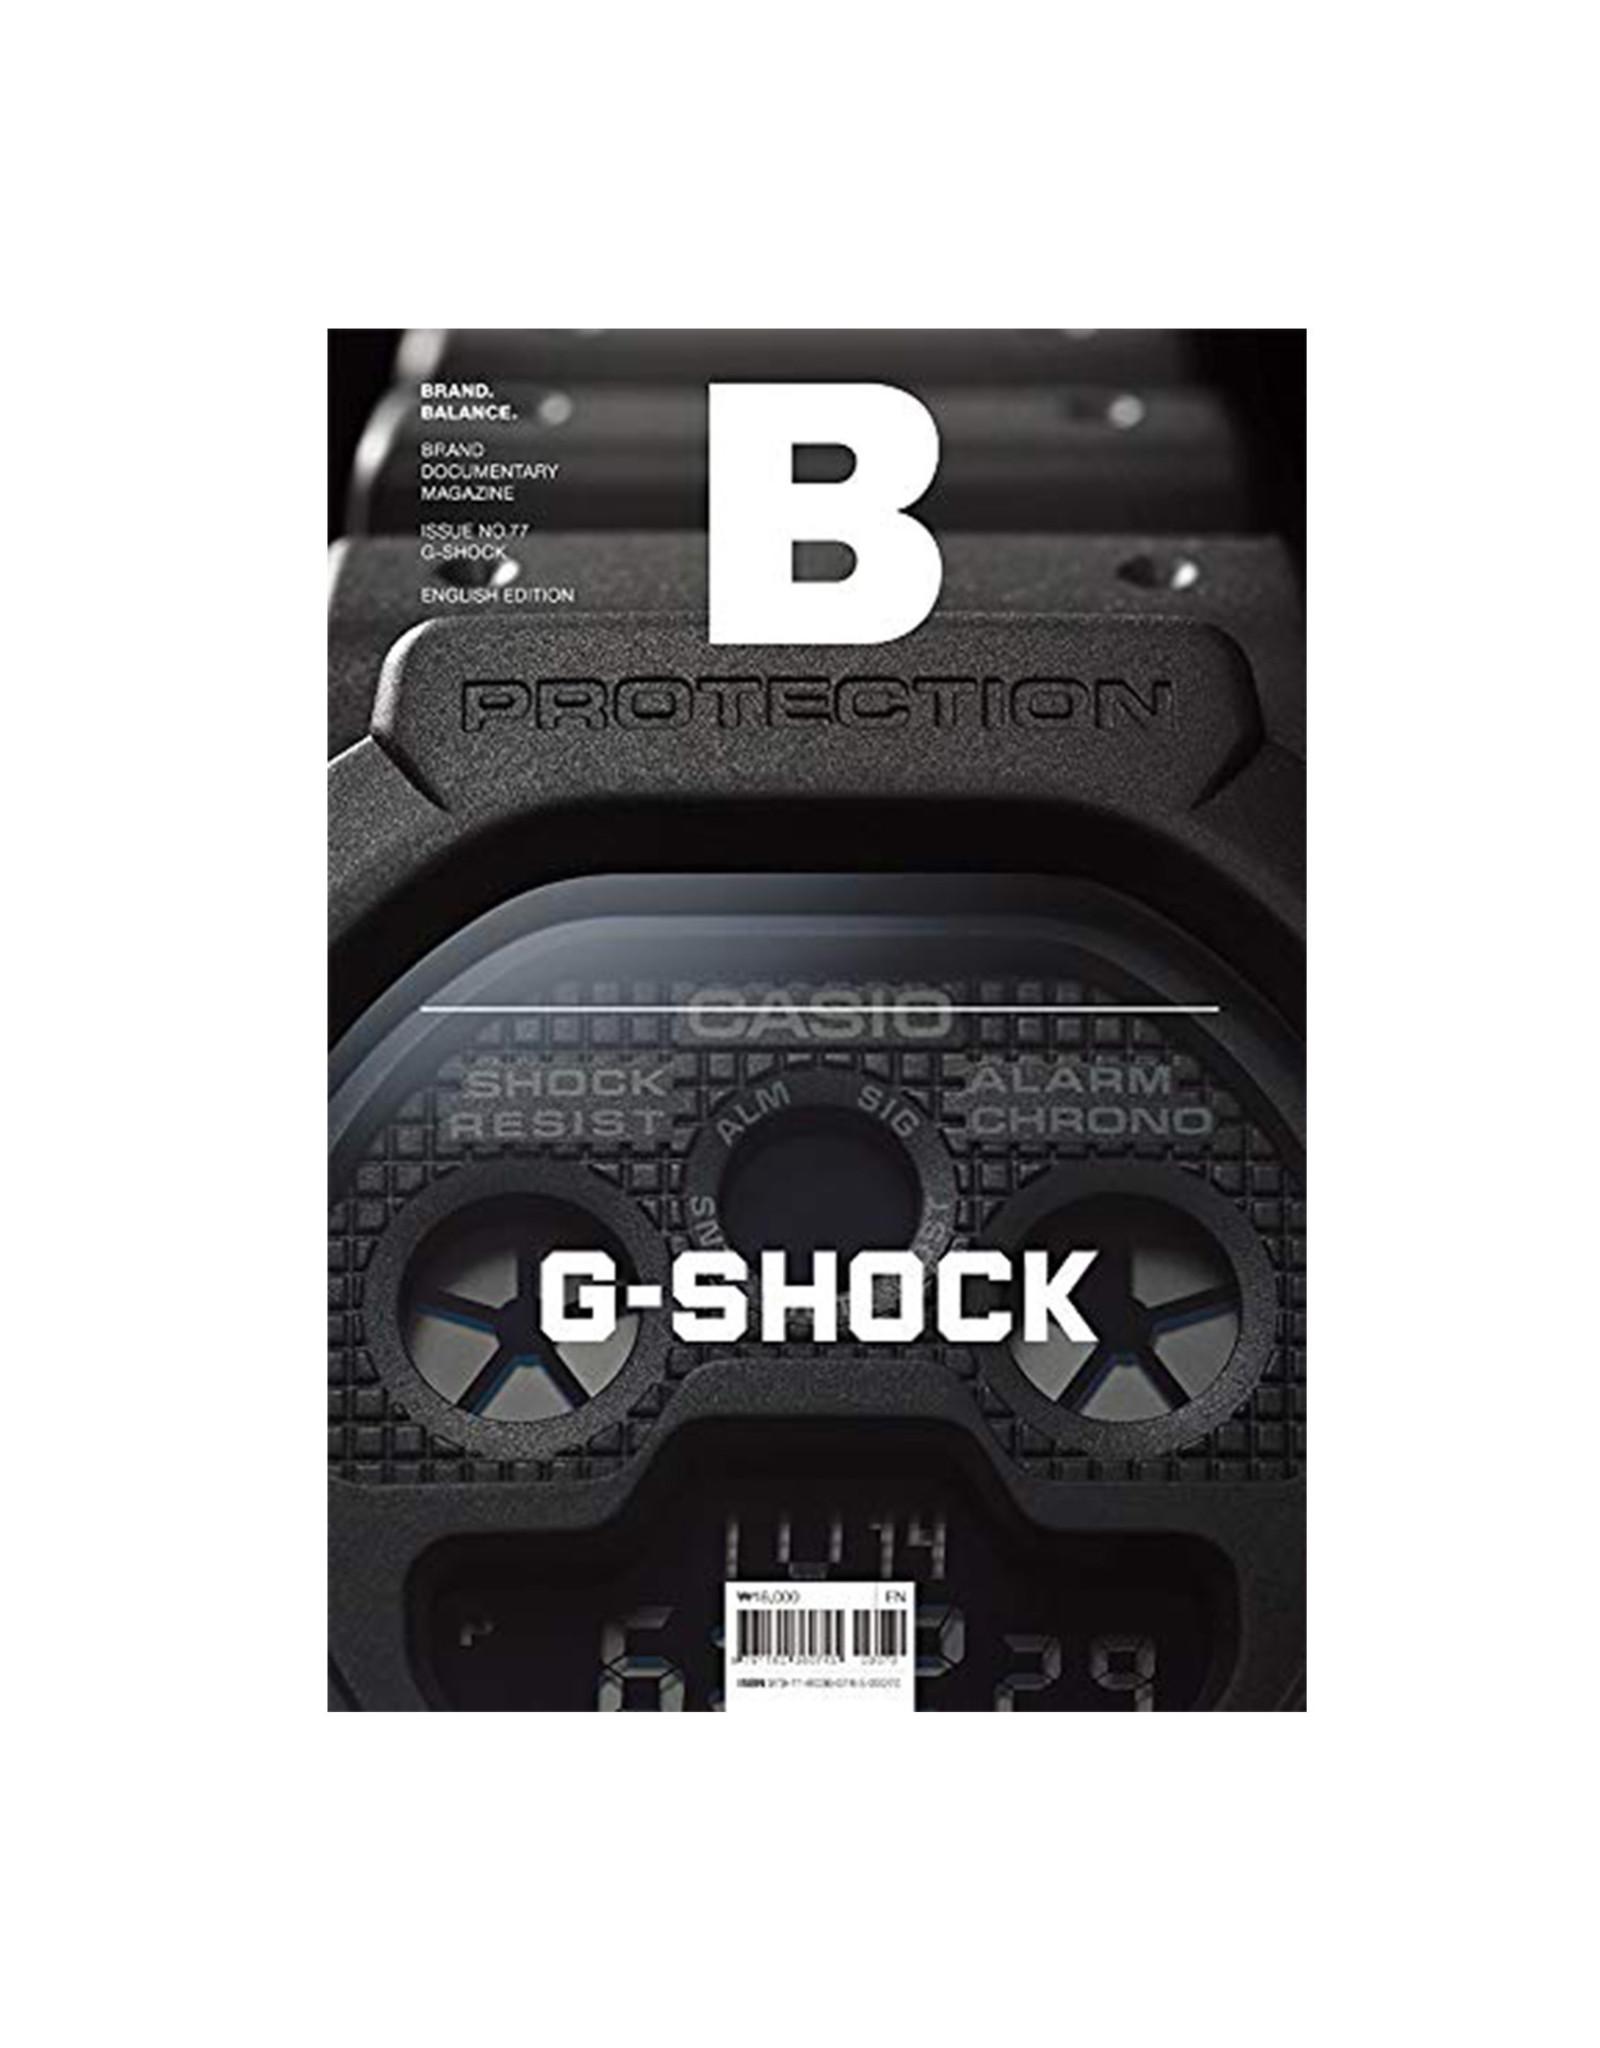 Magazine B, Issue 77 G-Shock